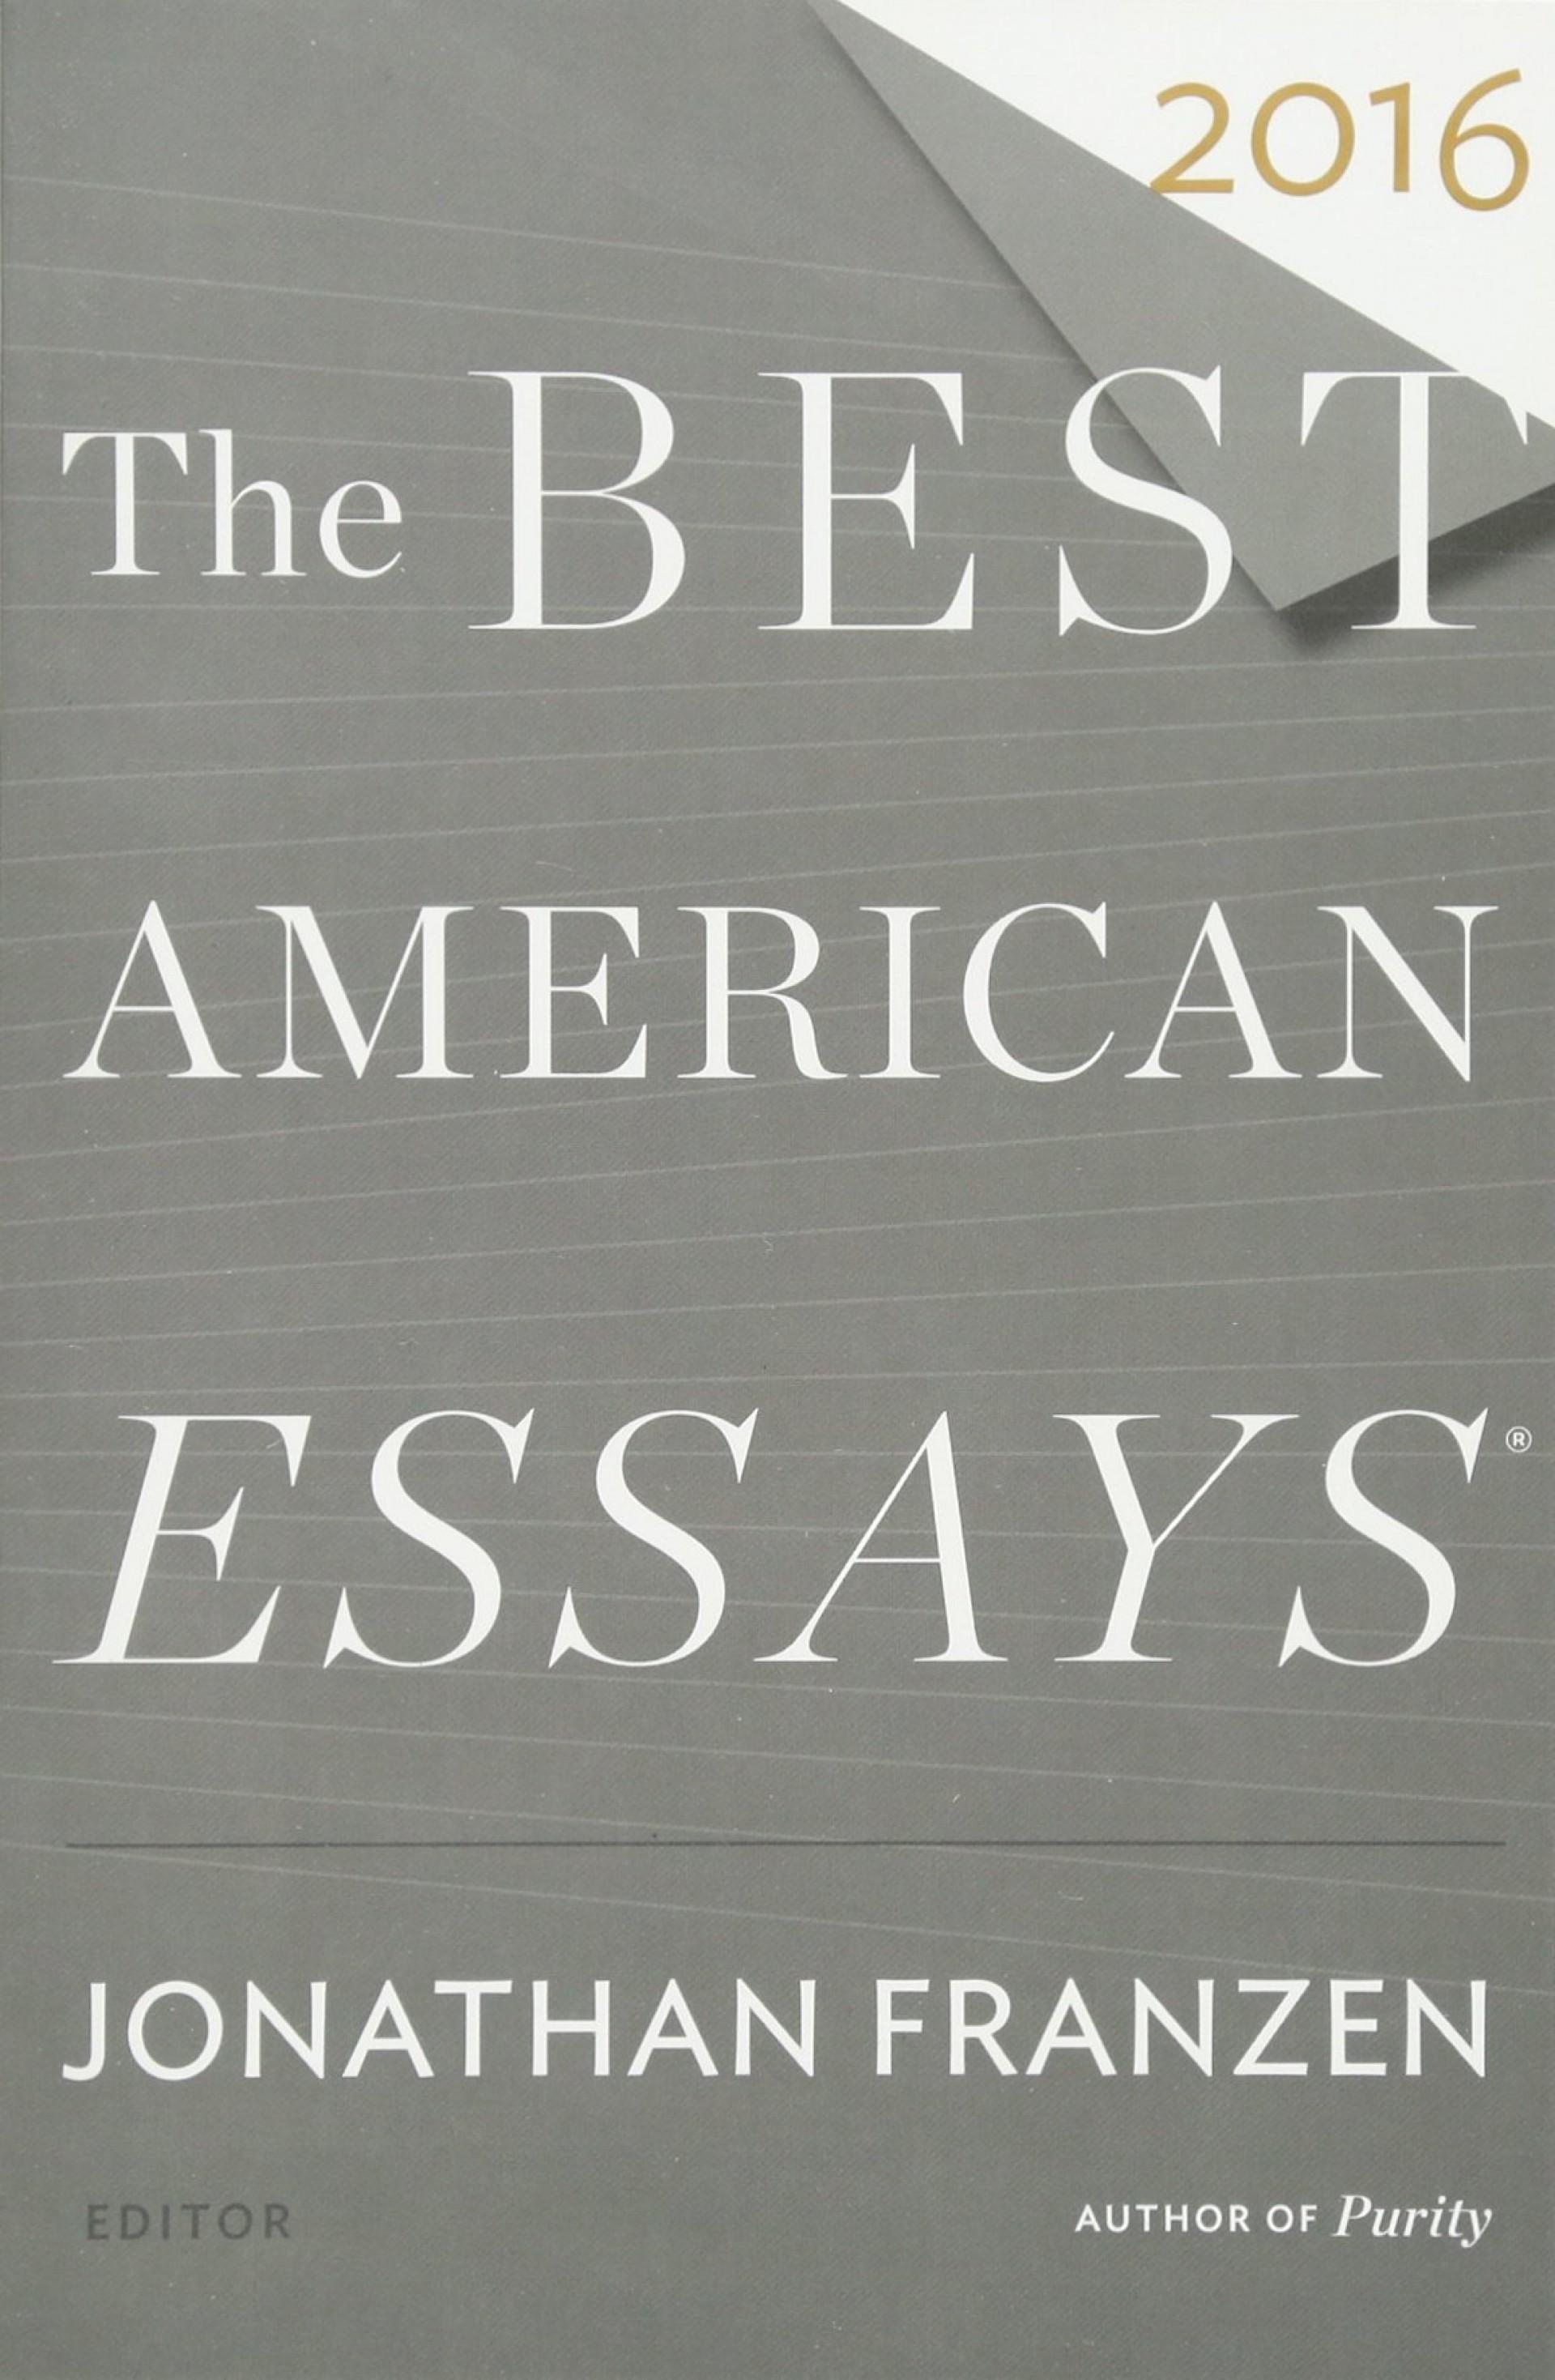 001 71a6bhsgsdl Essay Example Best American Essays Unique 2016 The Free Pdf Notables 1920